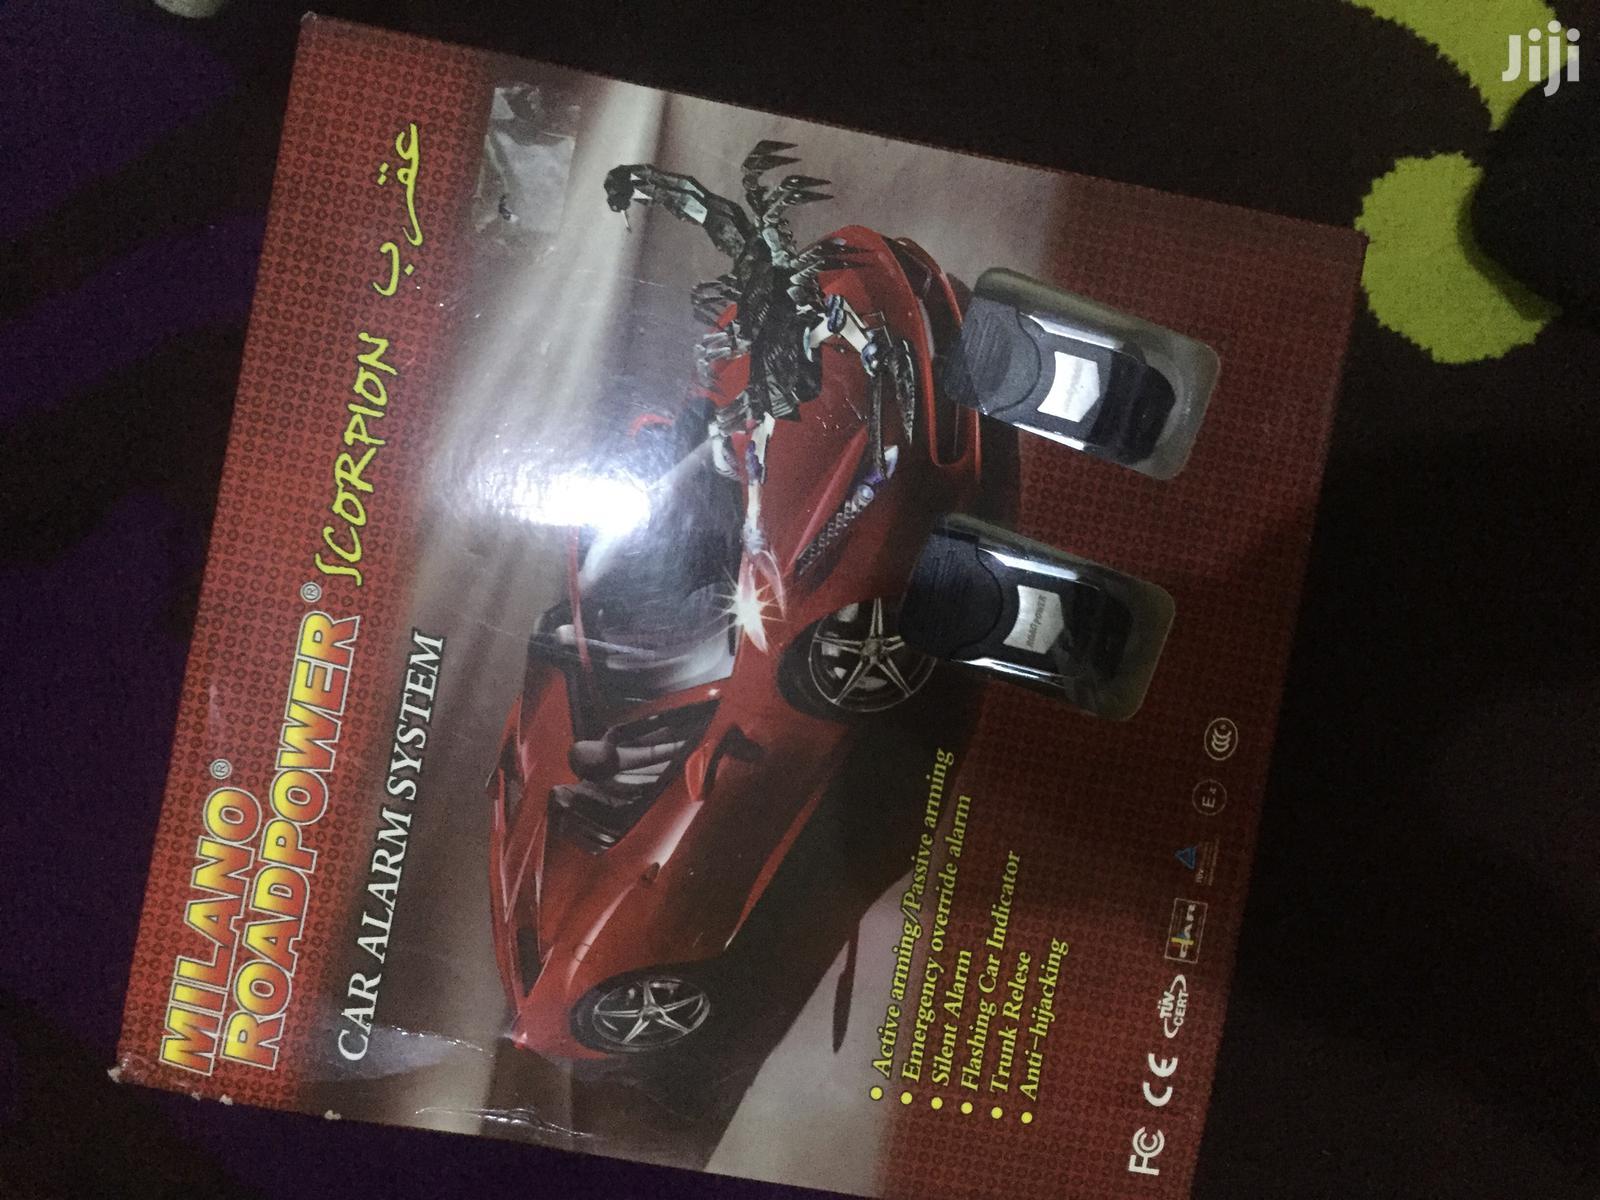 Scopion Car Alarm 227